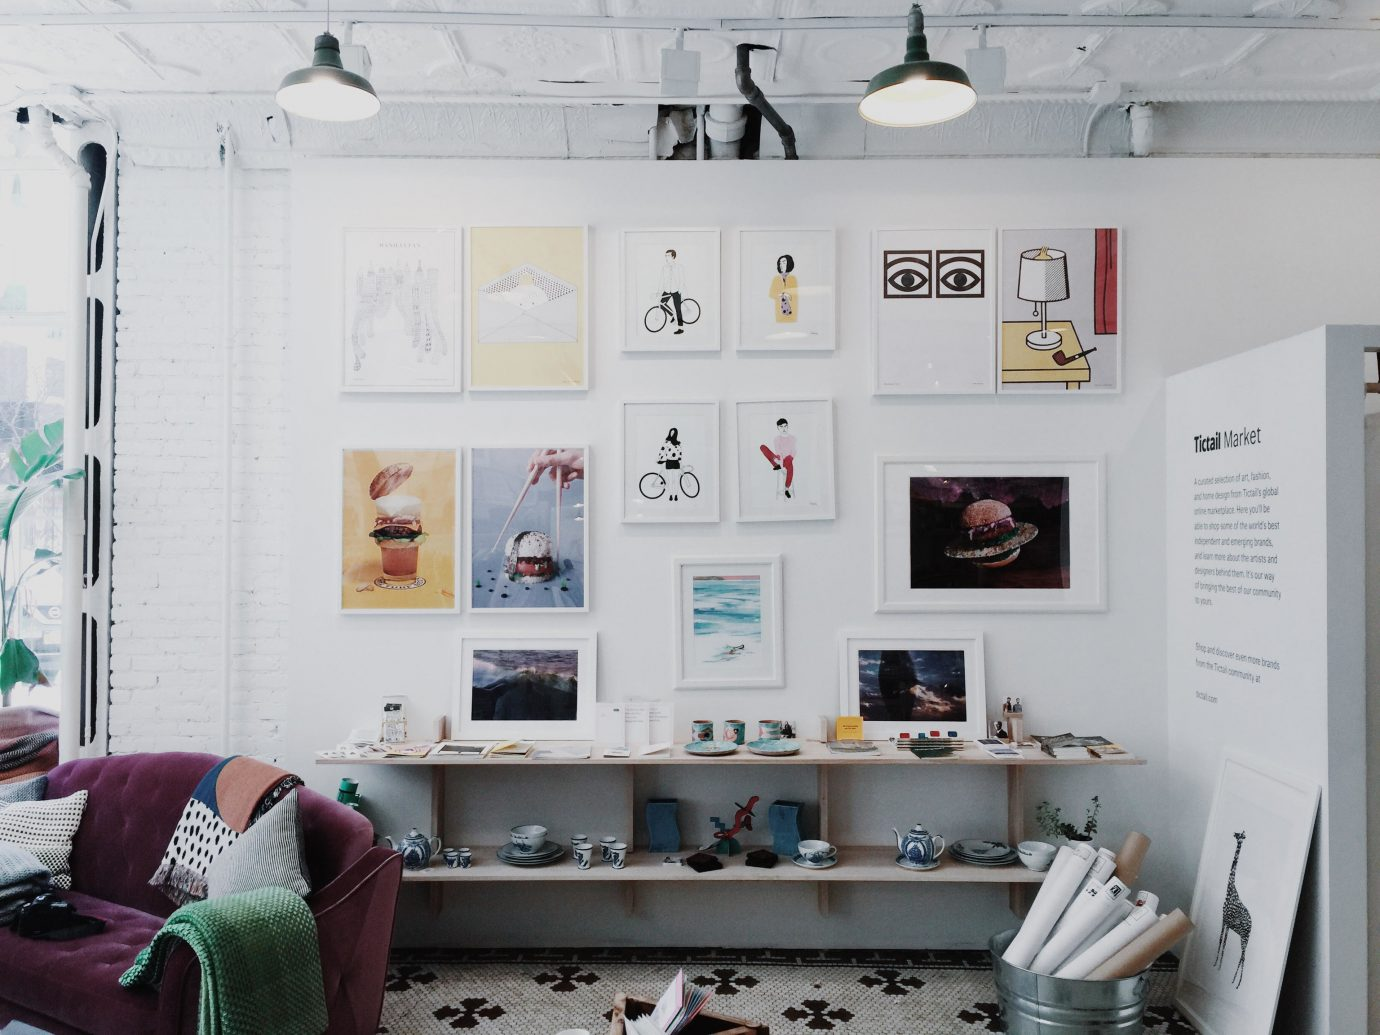 Hotels Jetsetter Guides Travel Tips Trip Ideas indoor wall room interior design art home Design living room several